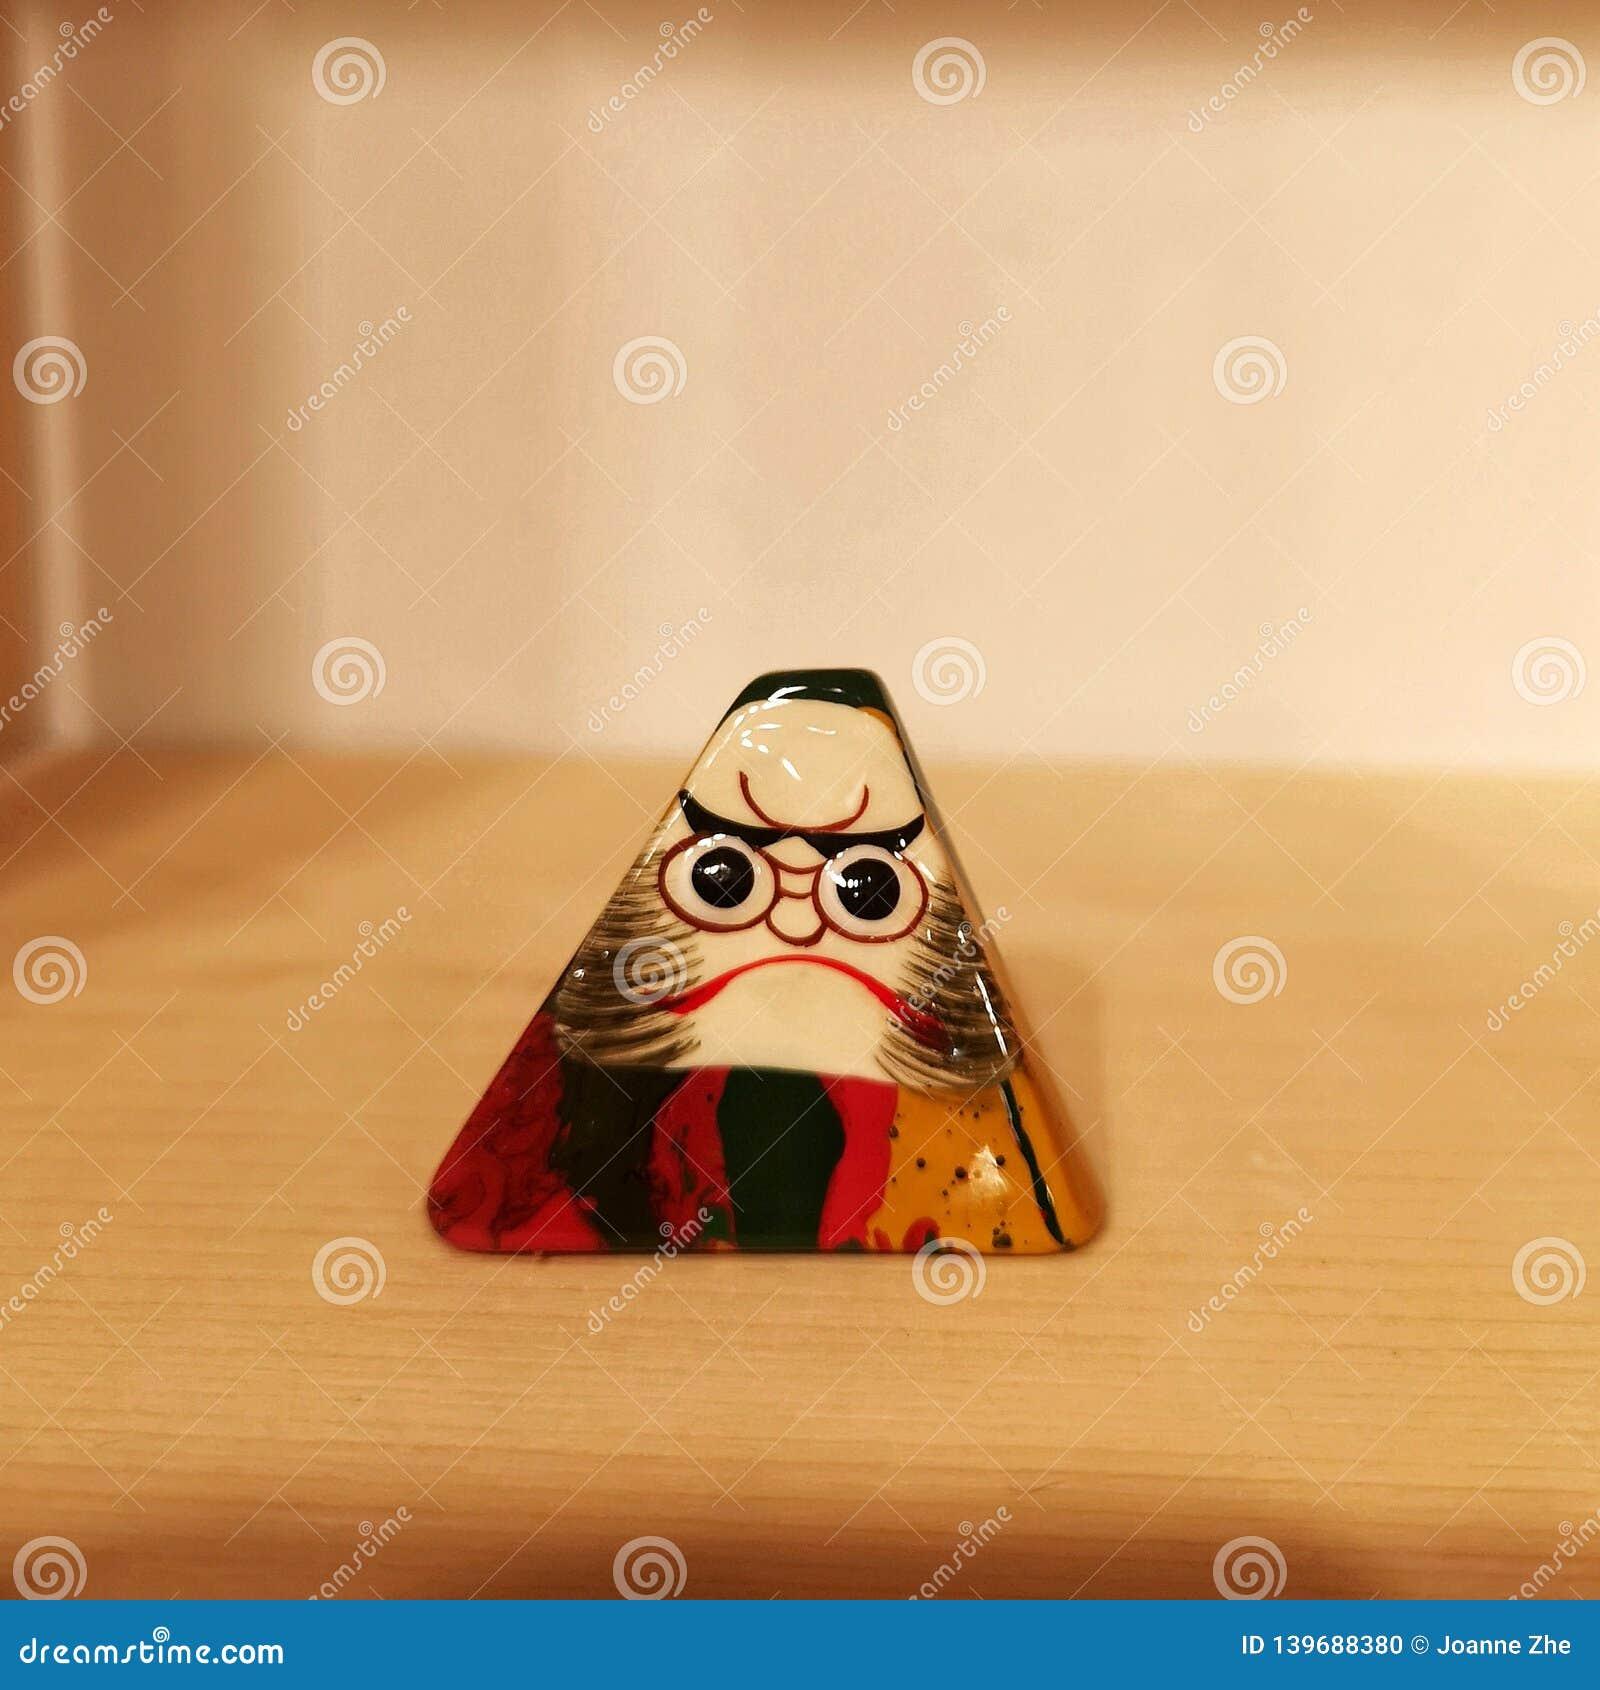 Traditional Japanese toy Daruma or Dharma